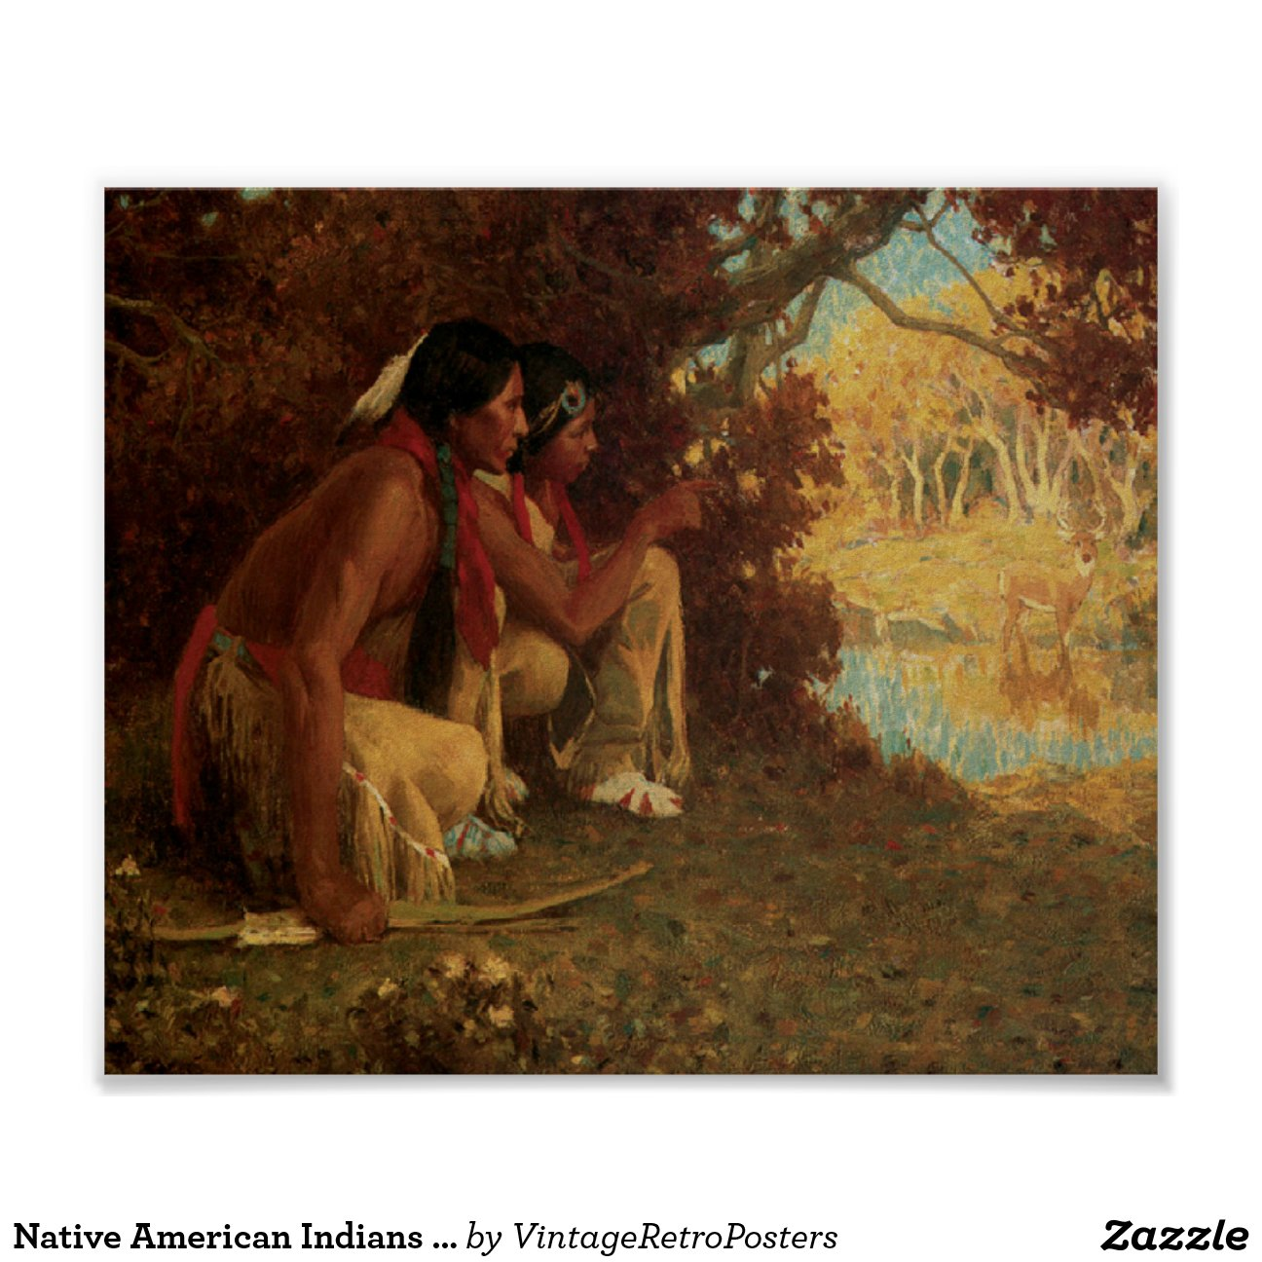 Native American Indians Deer Hunting Art Print Pos-re05c1eaaf718461ab9b526919fb6d2ab 41t 8byvr